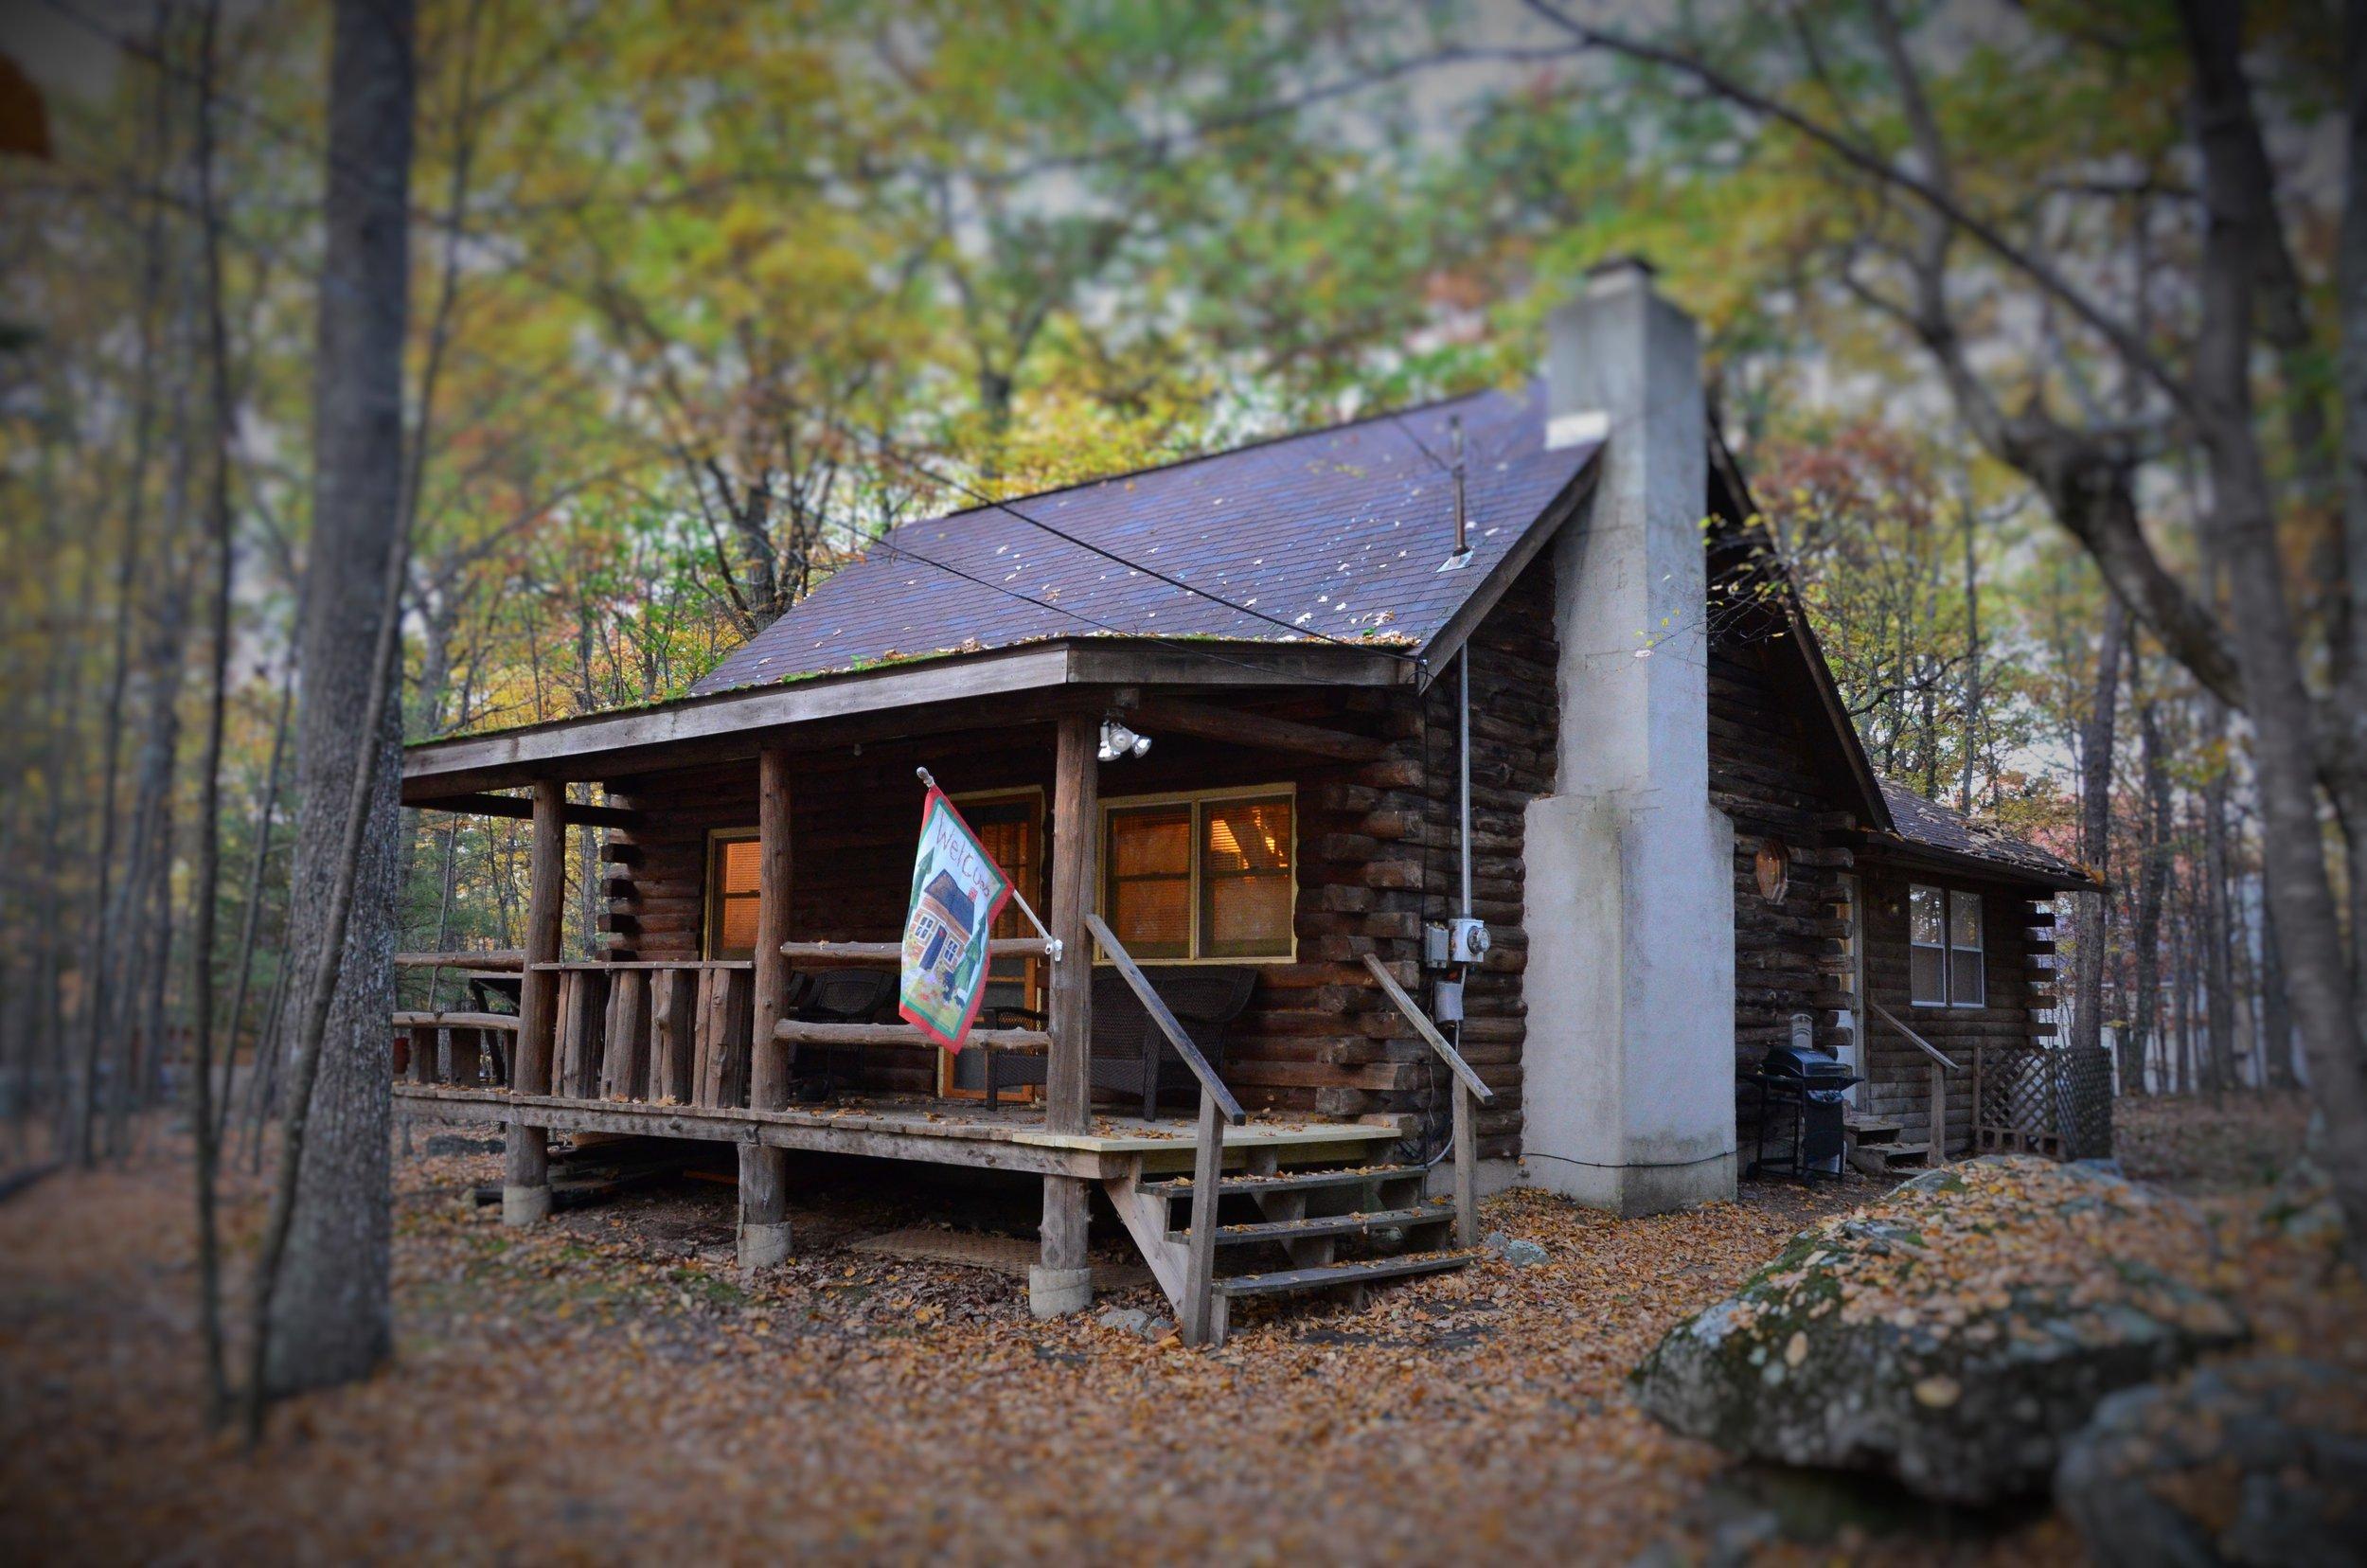 masthope log cabin  3 bedrooms, 2 bathrooms